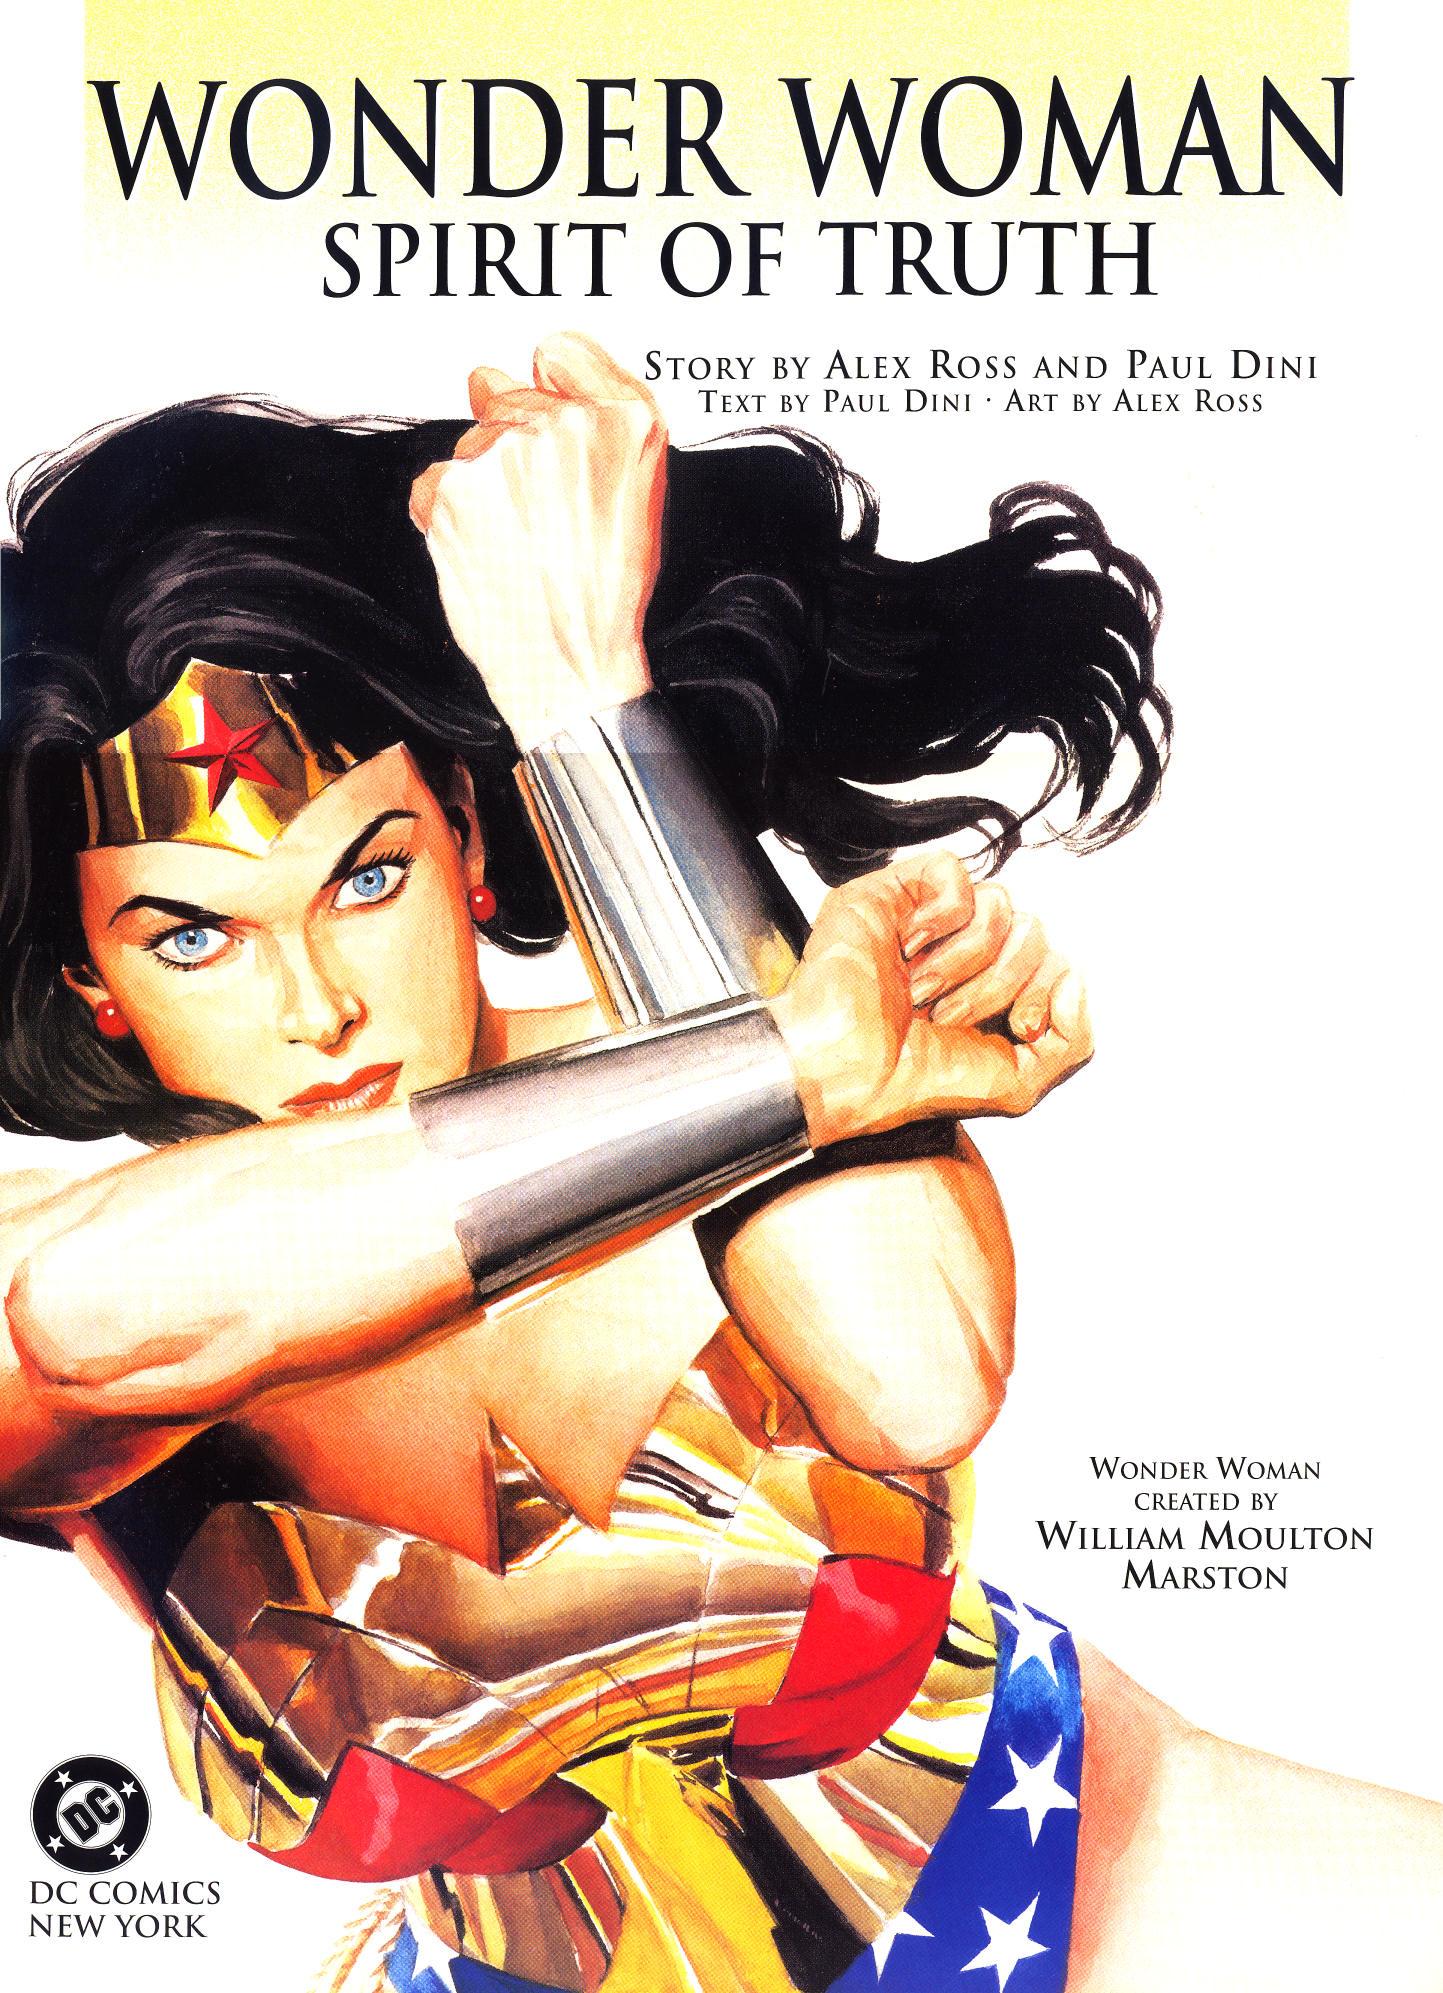 Read online Wonder Woman: Spirit of Truth comic -  Issue # Full - 4